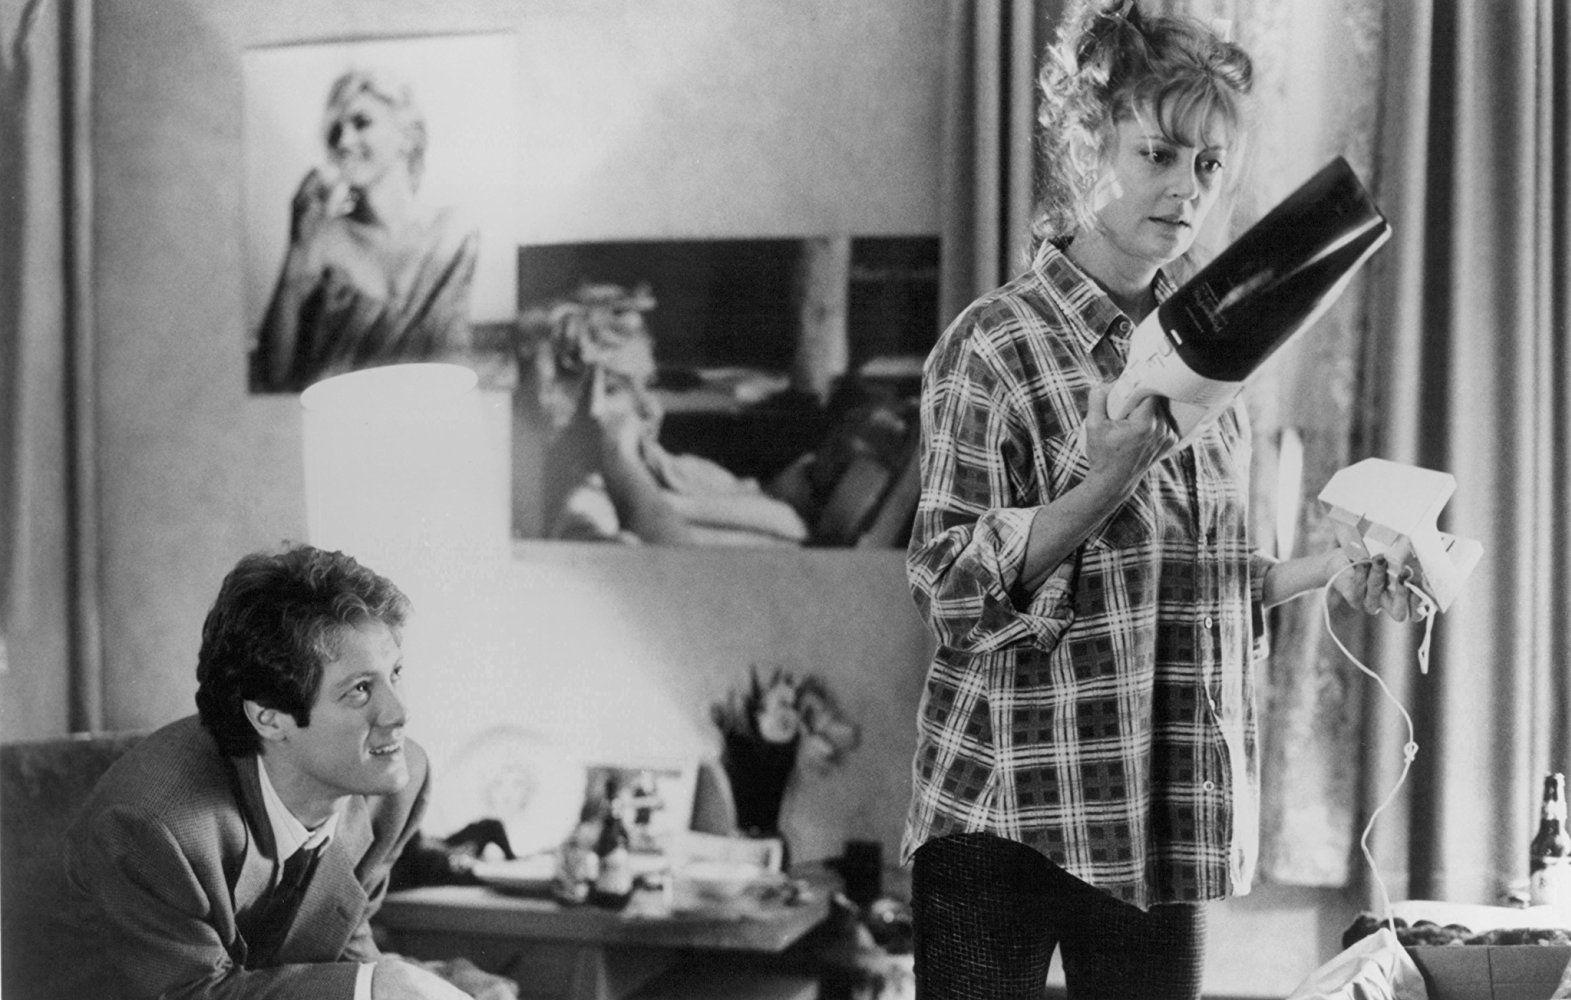 Susan Sarandon and James Spader in White Palace (1990